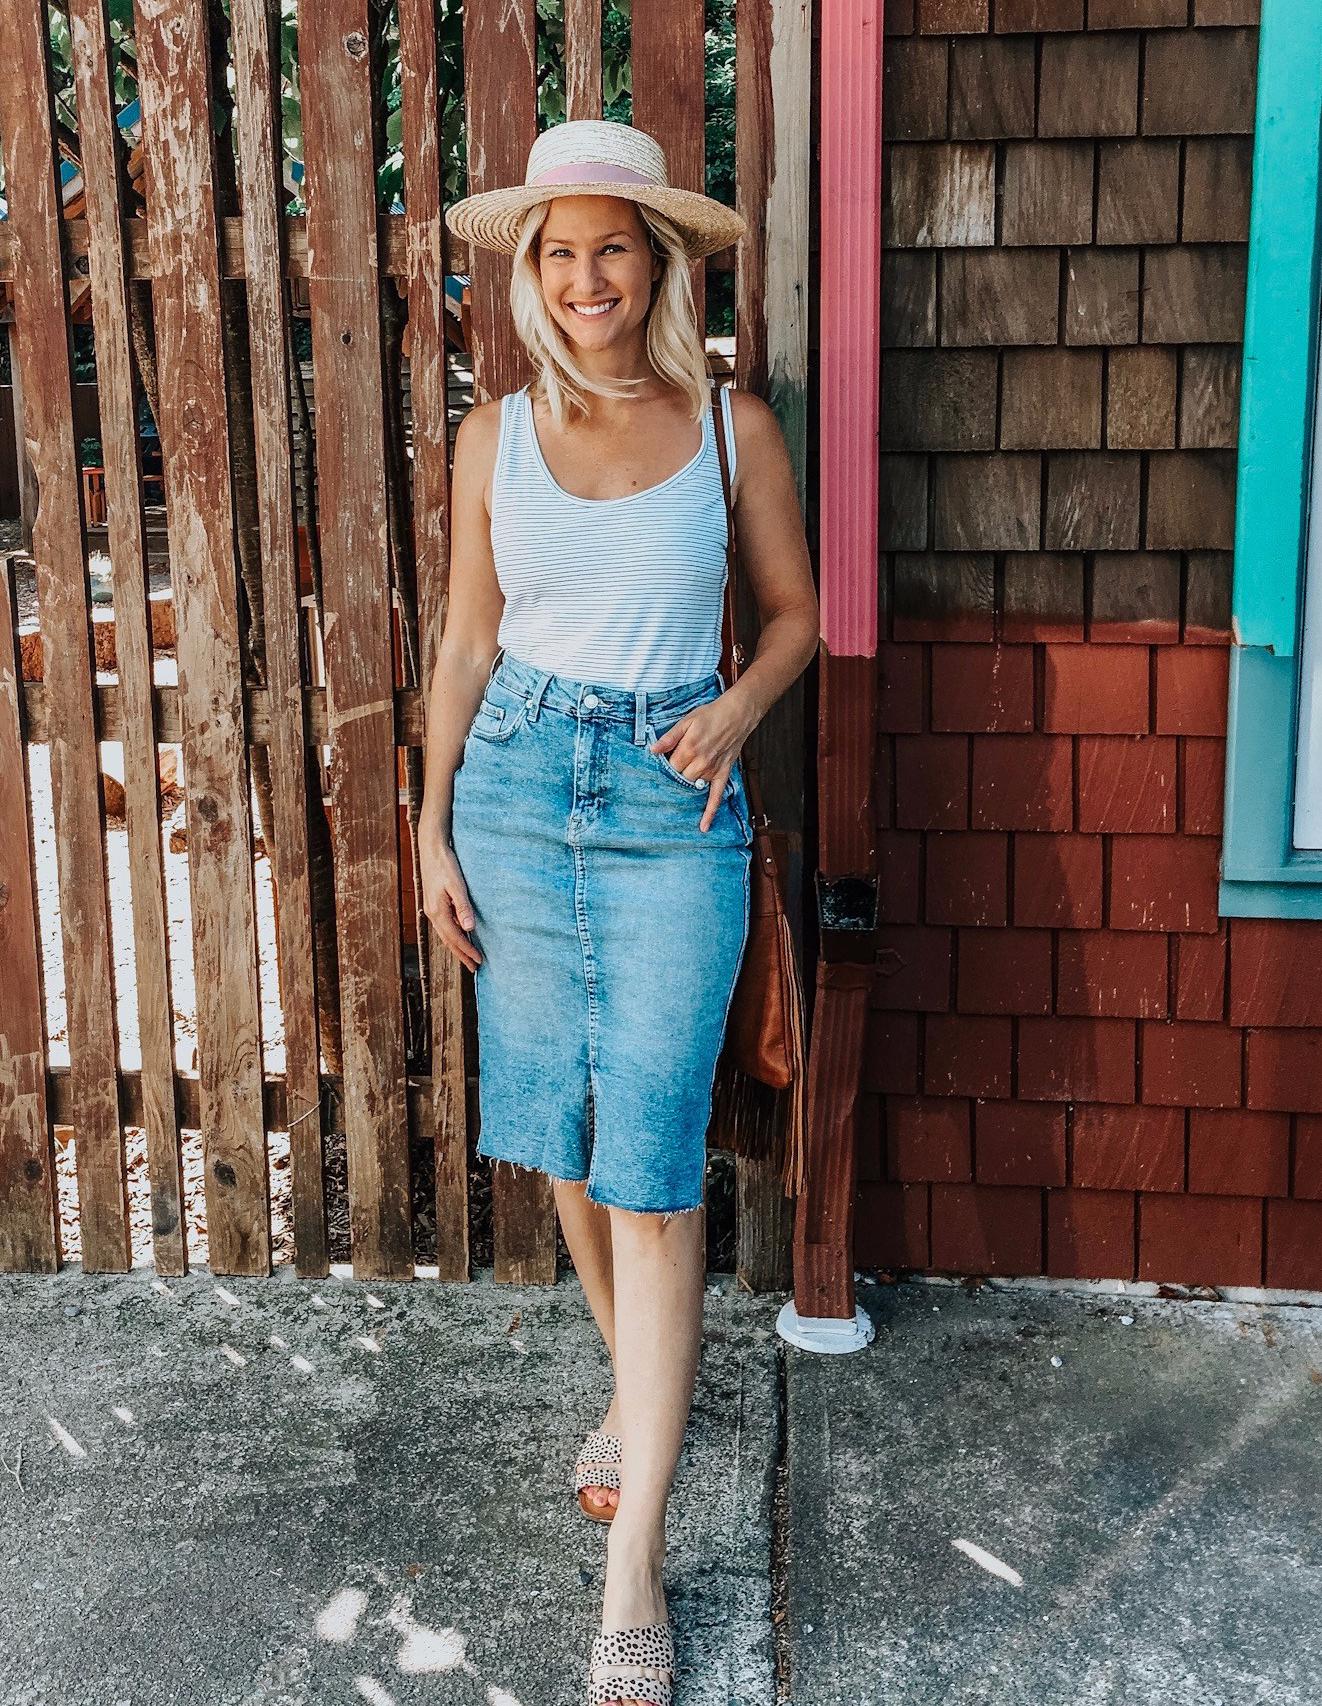 Denim skirt & straw hat